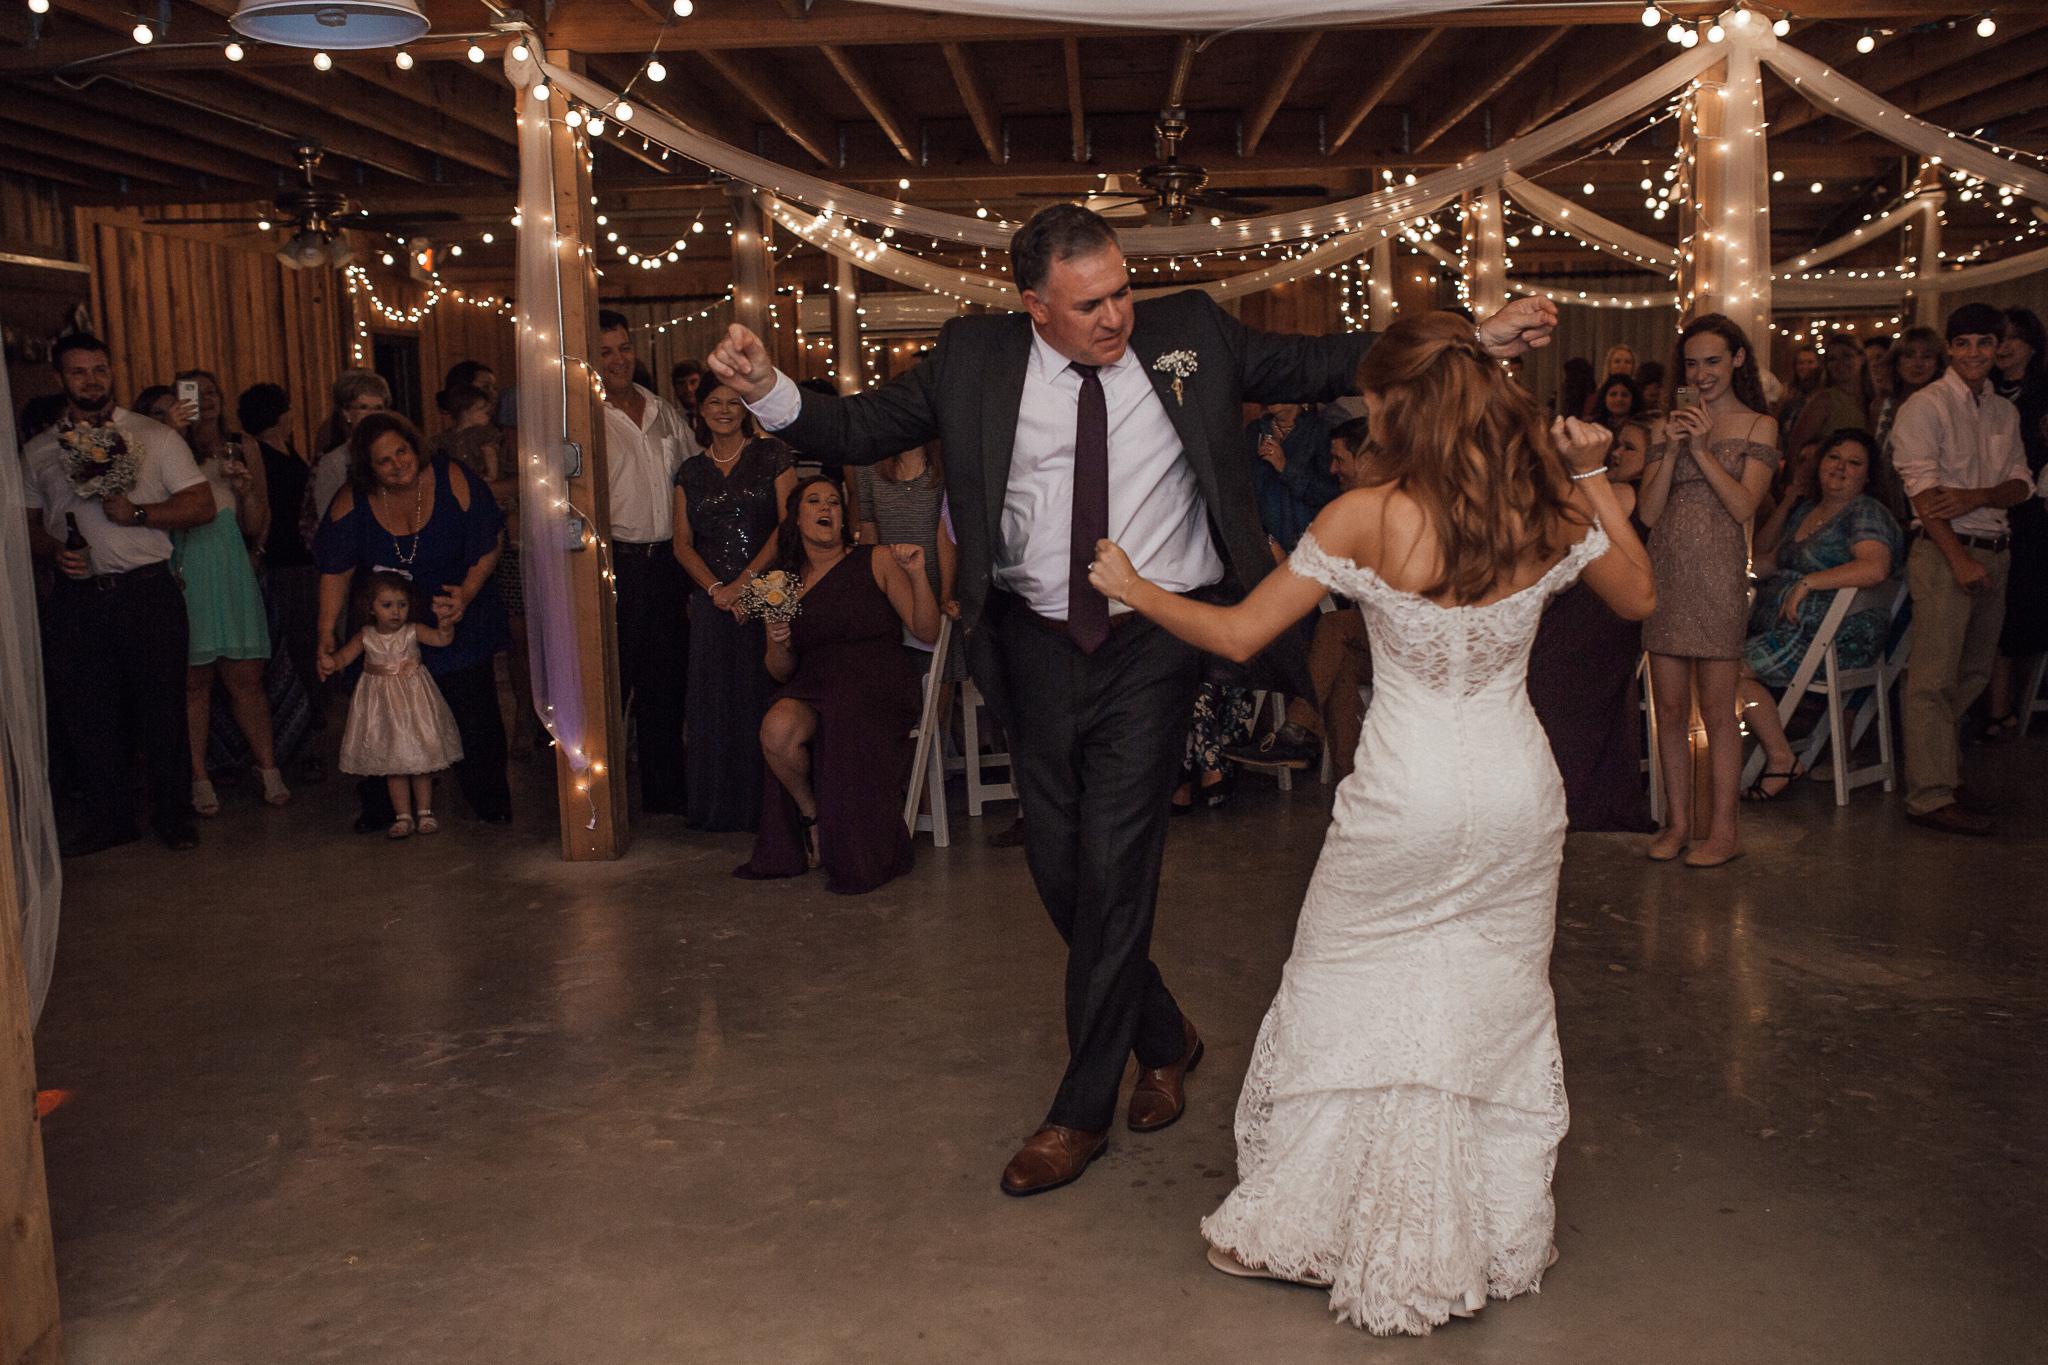 cassie-cook-photography-hernando-wedding-venue-cedar-hill-farms-southern-wedding-venue